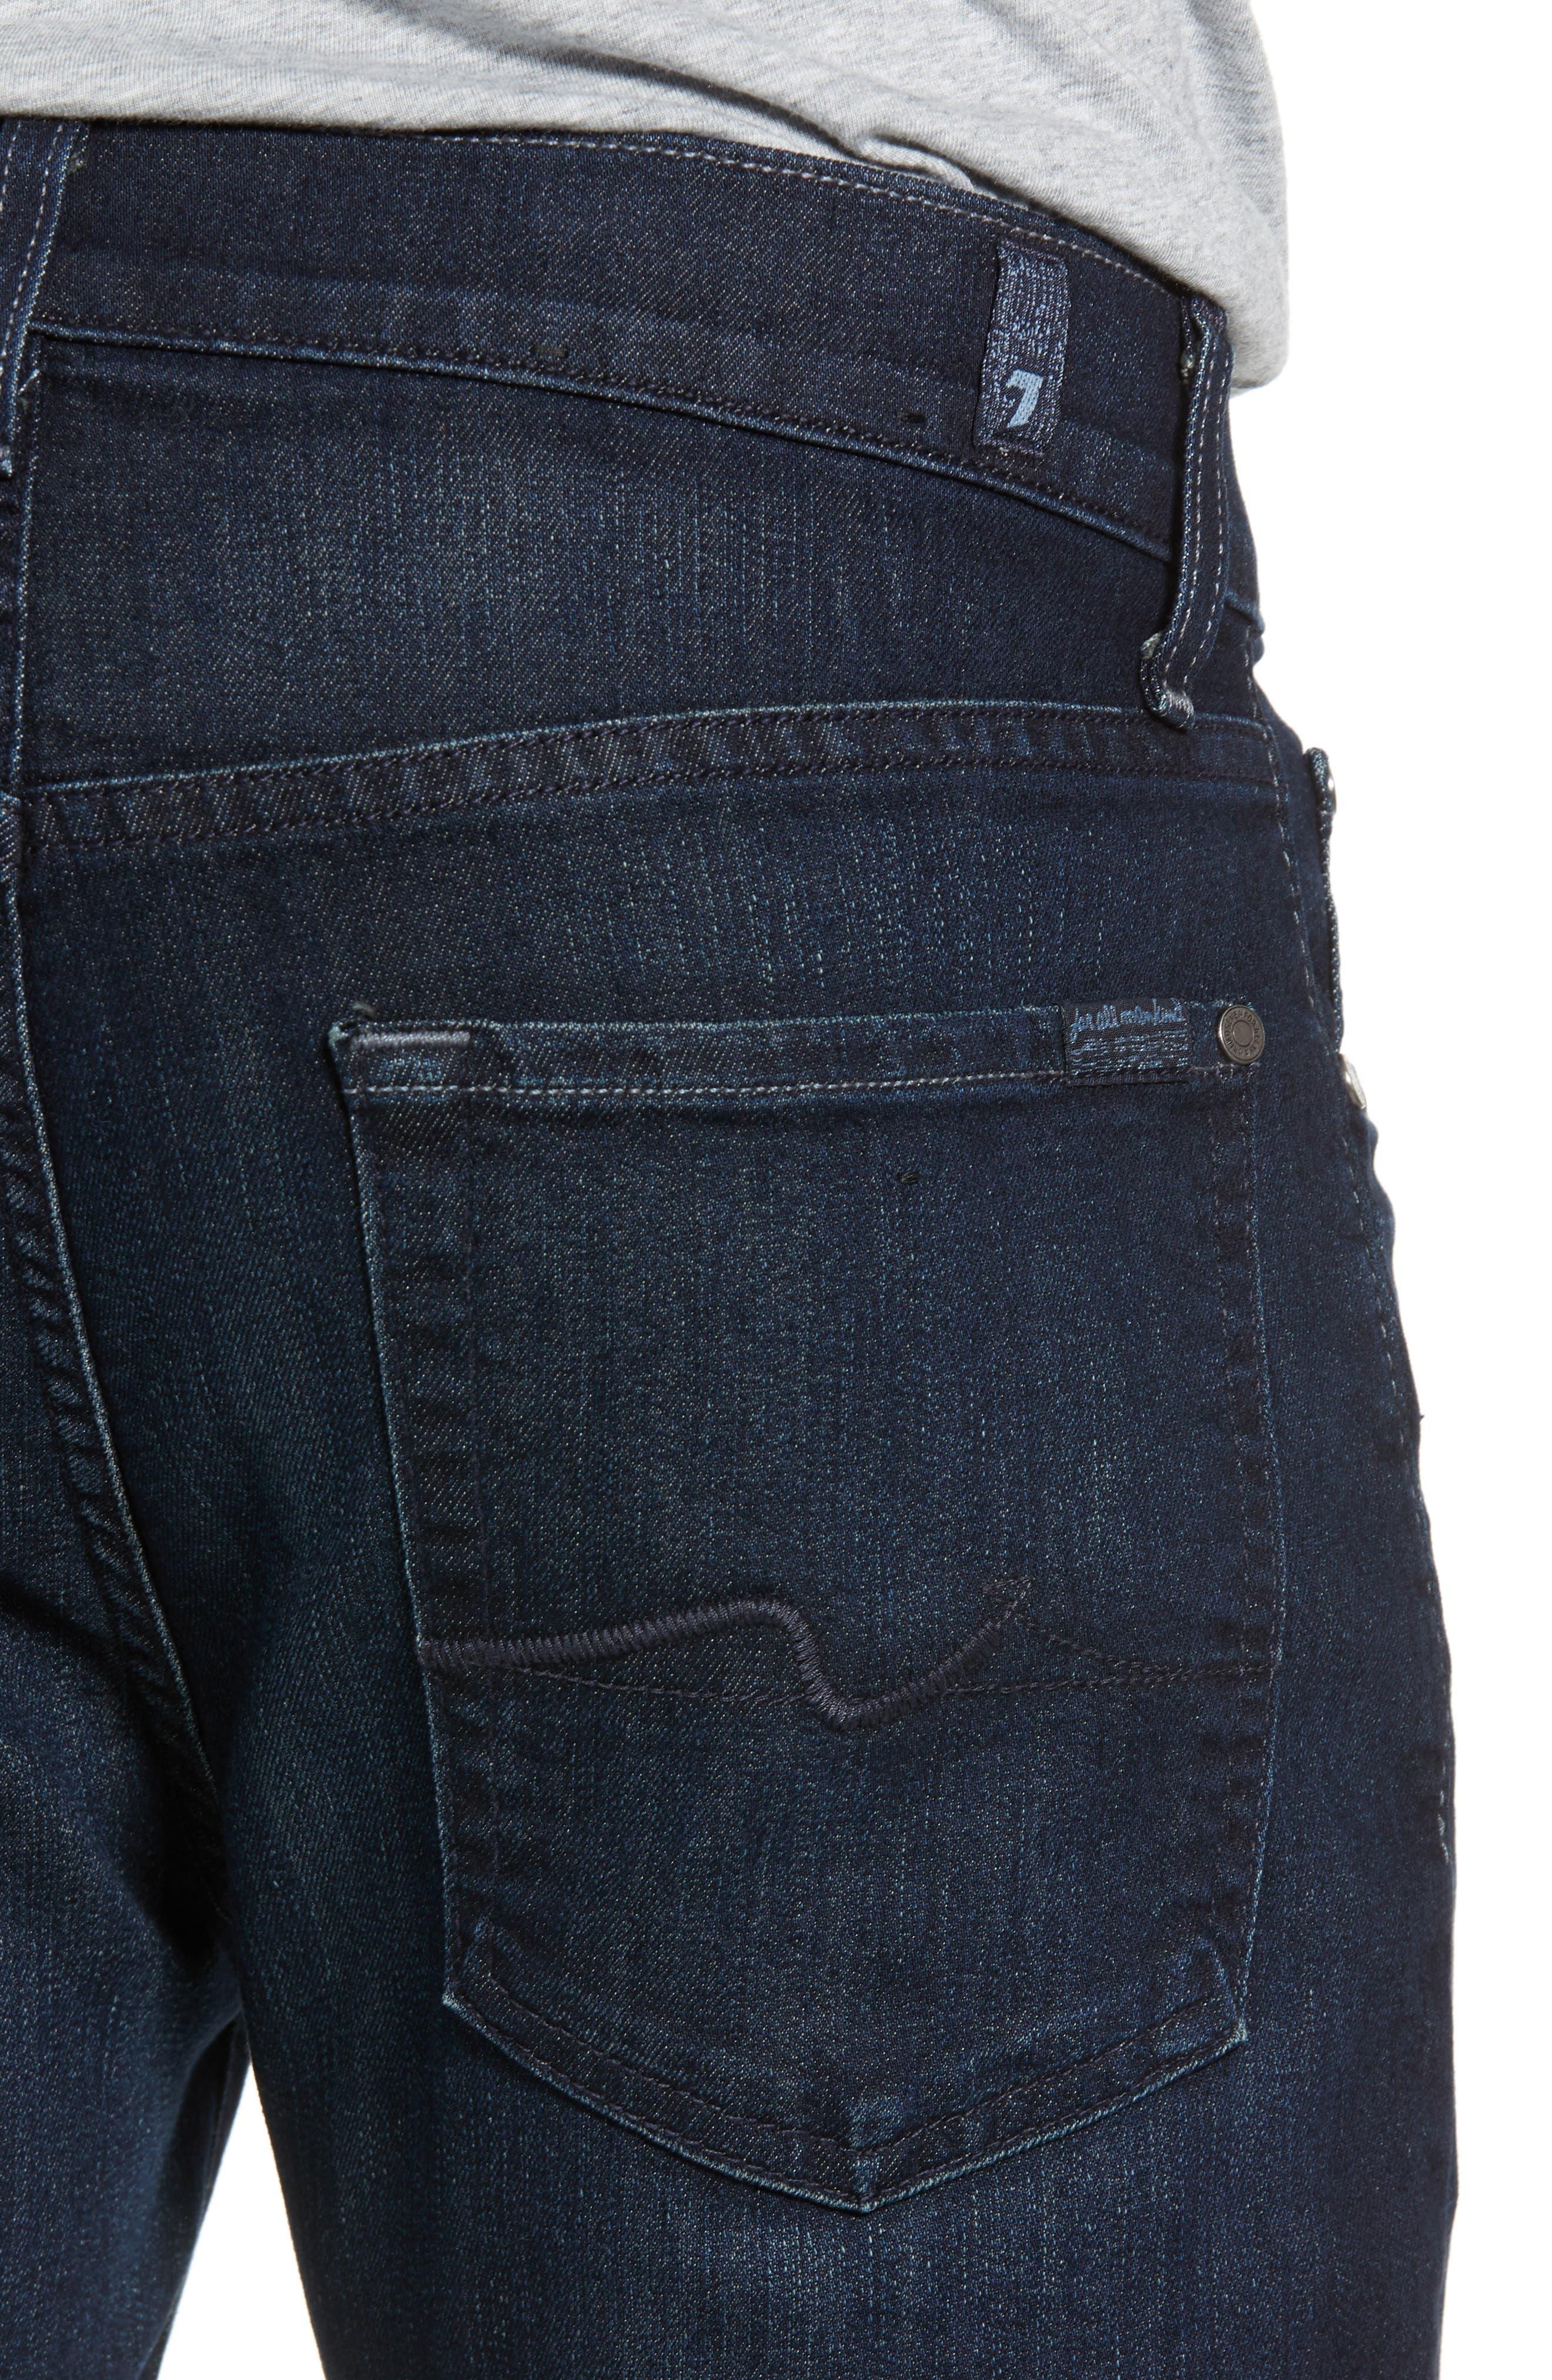 Airweft Standard Straight Leg Jeans,                             Alternate thumbnail 4, color,                             Perennial